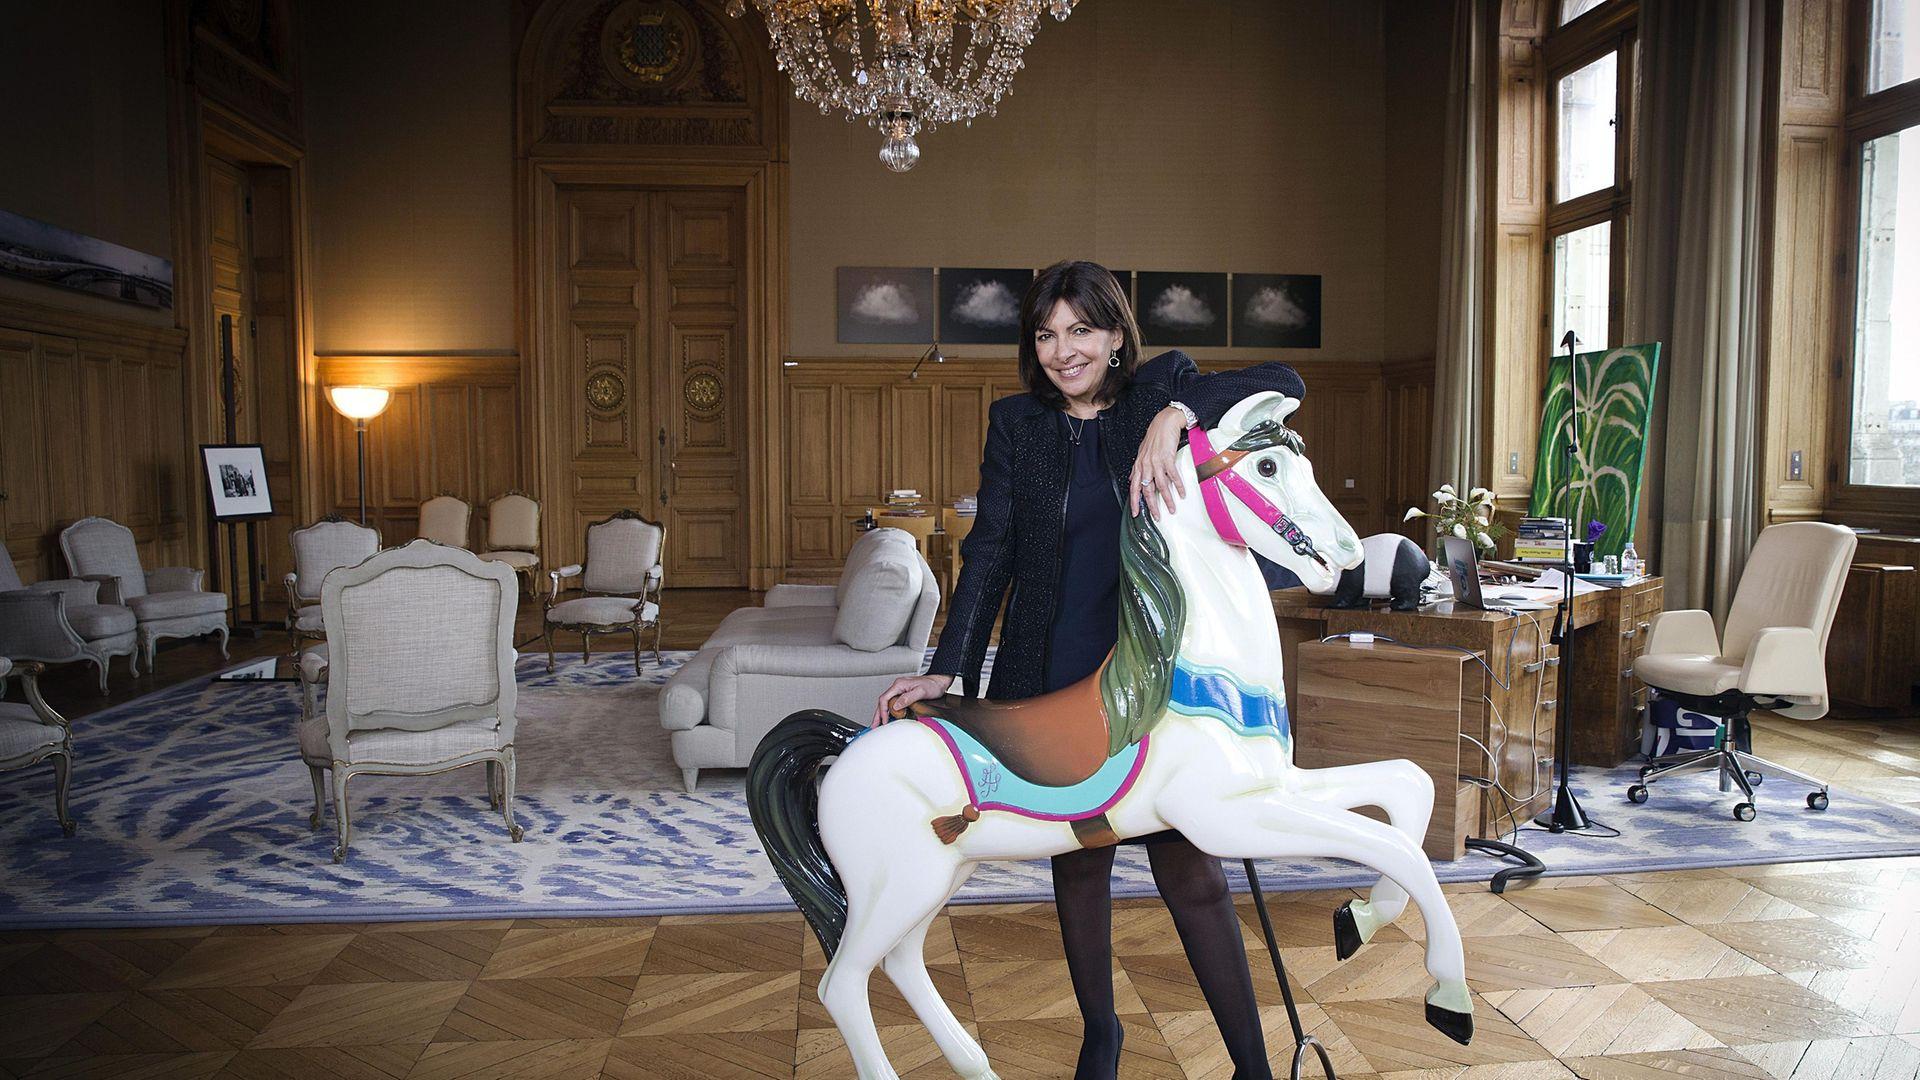 Paris mayor Anne Hidalgo in her City Hall office, in 2015 - Credit: AFP via Getty Images